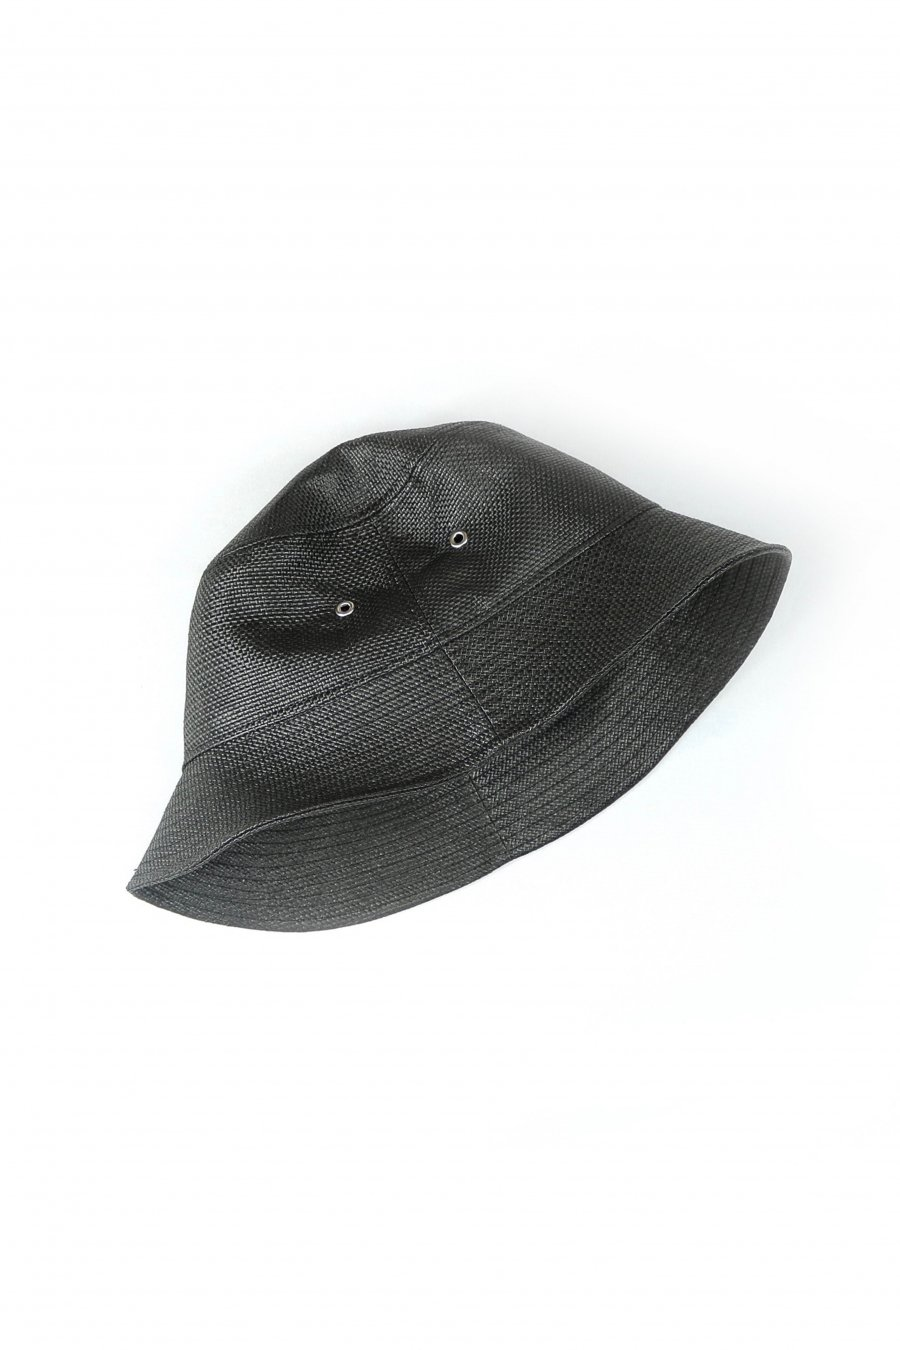 elephant TRIBAL fabrics  Resort Bucket hat(BLACK)<img class='new_mark_img2' src='https://img.shop-pro.jp/img/new/icons15.gif' style='border:none;display:inline;margin:0px;padding:0px;width:auto;' />